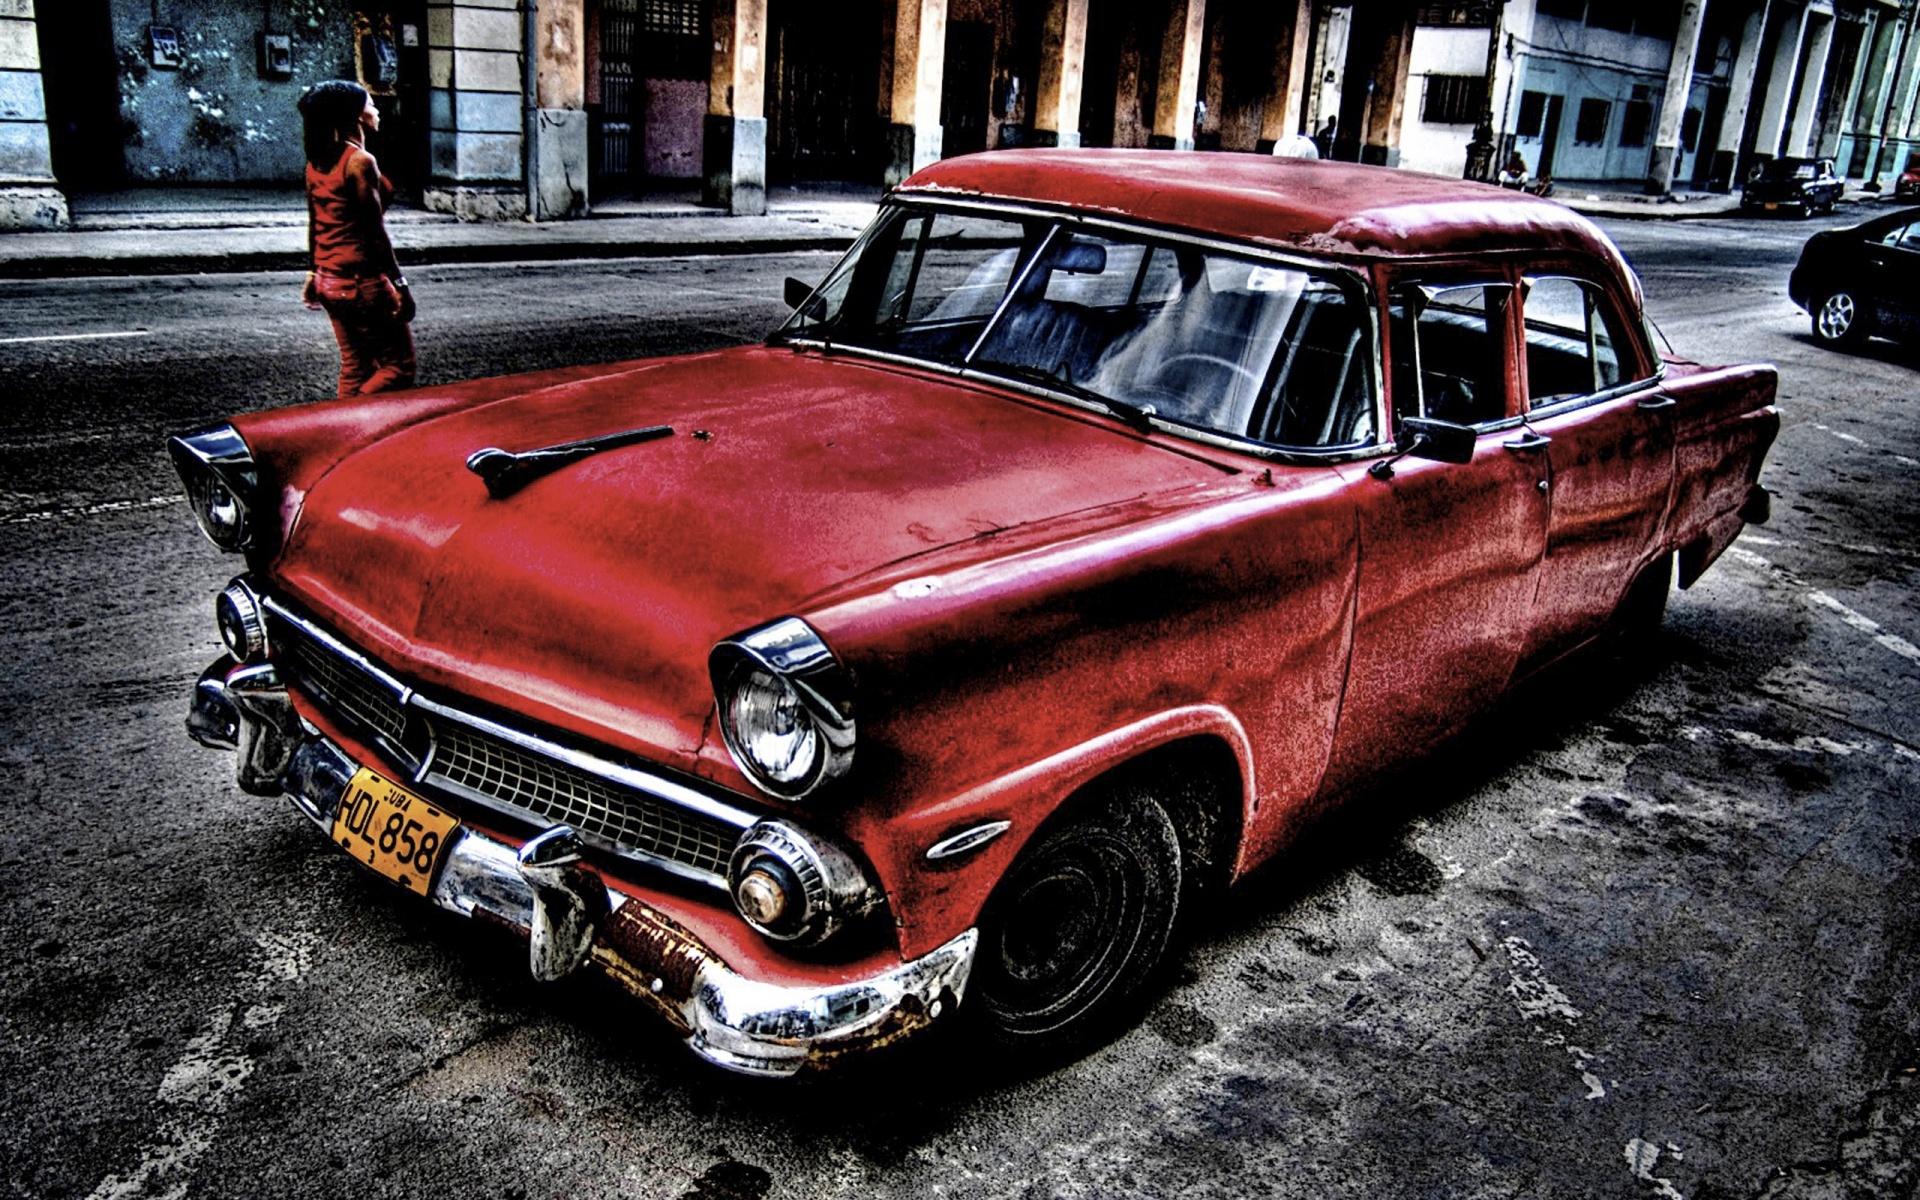 Old Car wallpaper - 762716